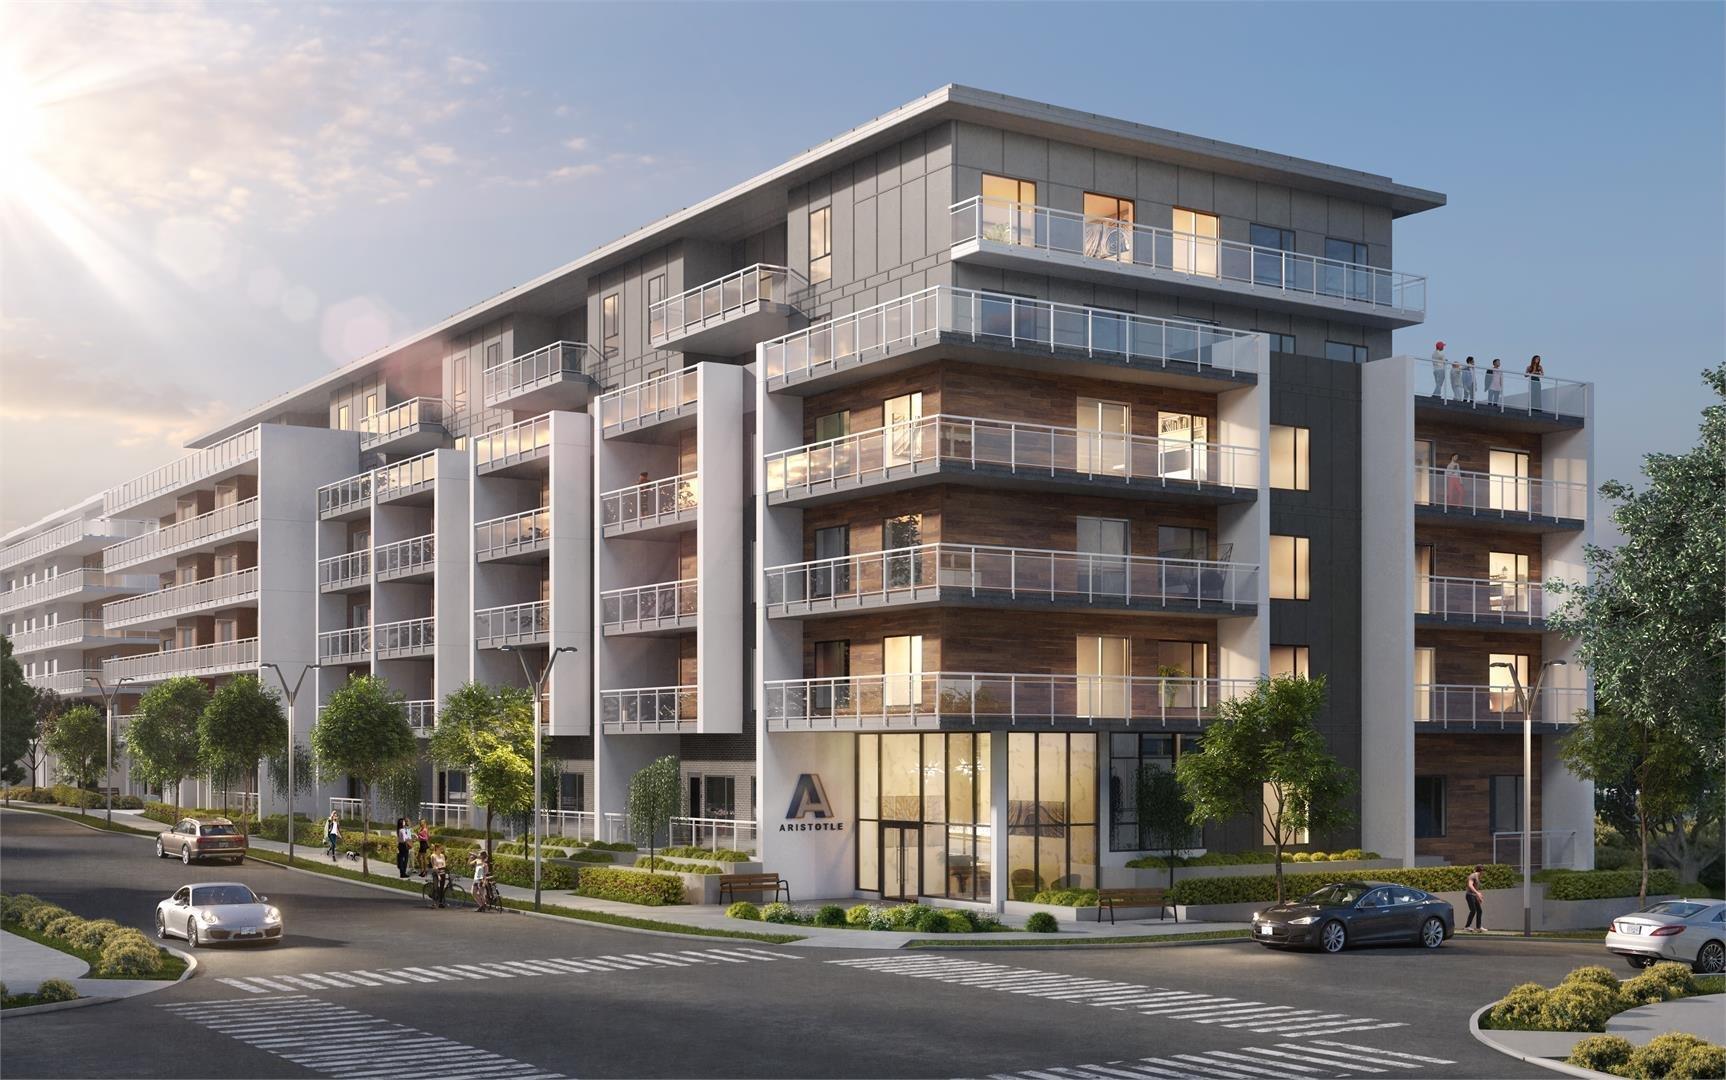 20203 84 Ave, Langley City, BC V2Y 2B7, Canada - Exterior!